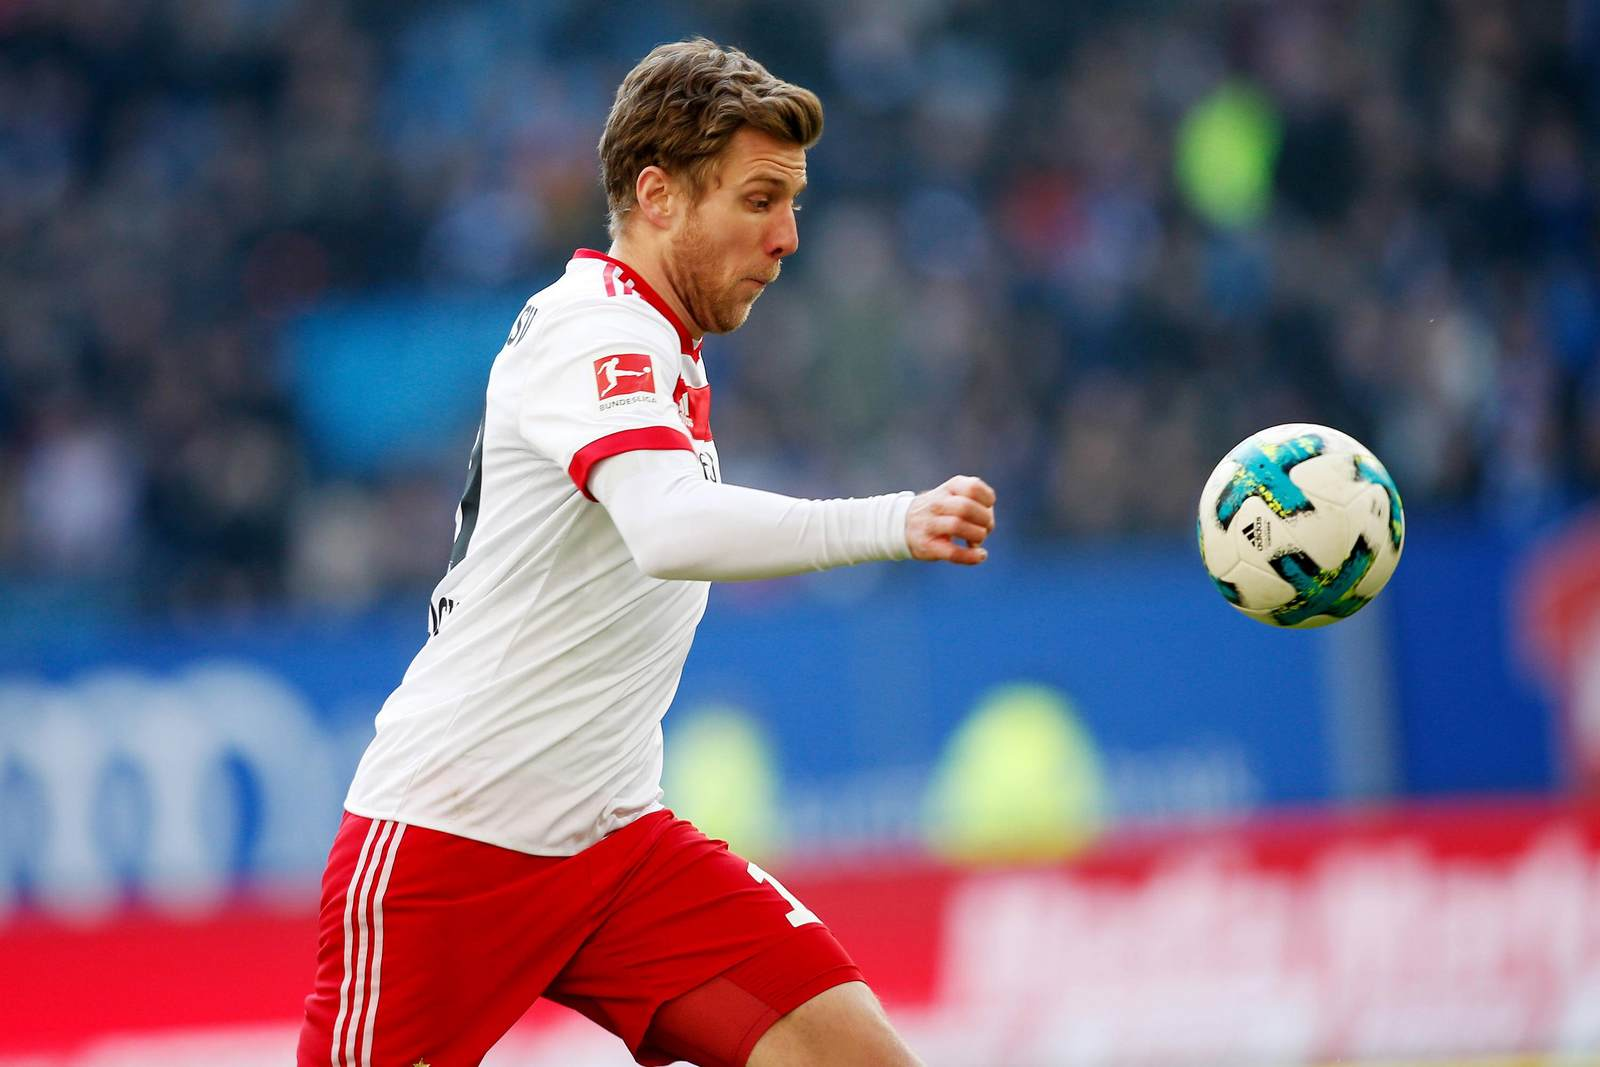 Sven Schipplock am Ball für den HSV